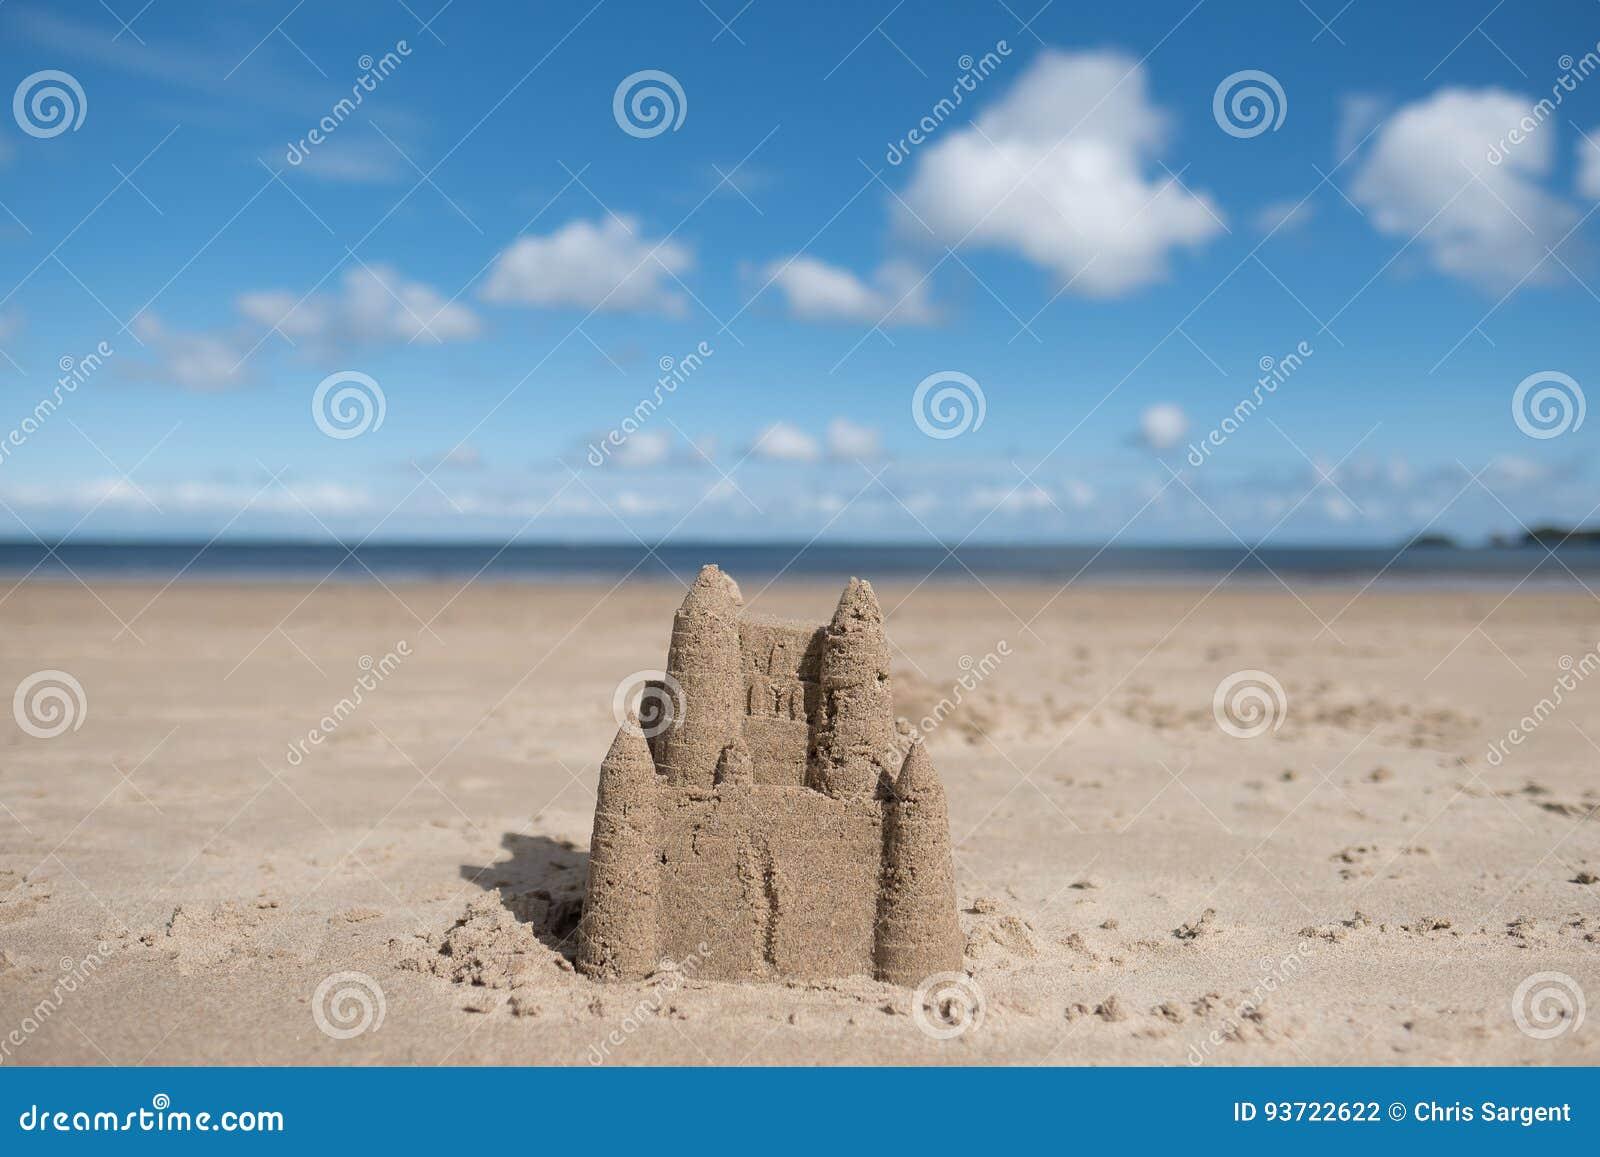 Zandkasteel op een strand in Wales